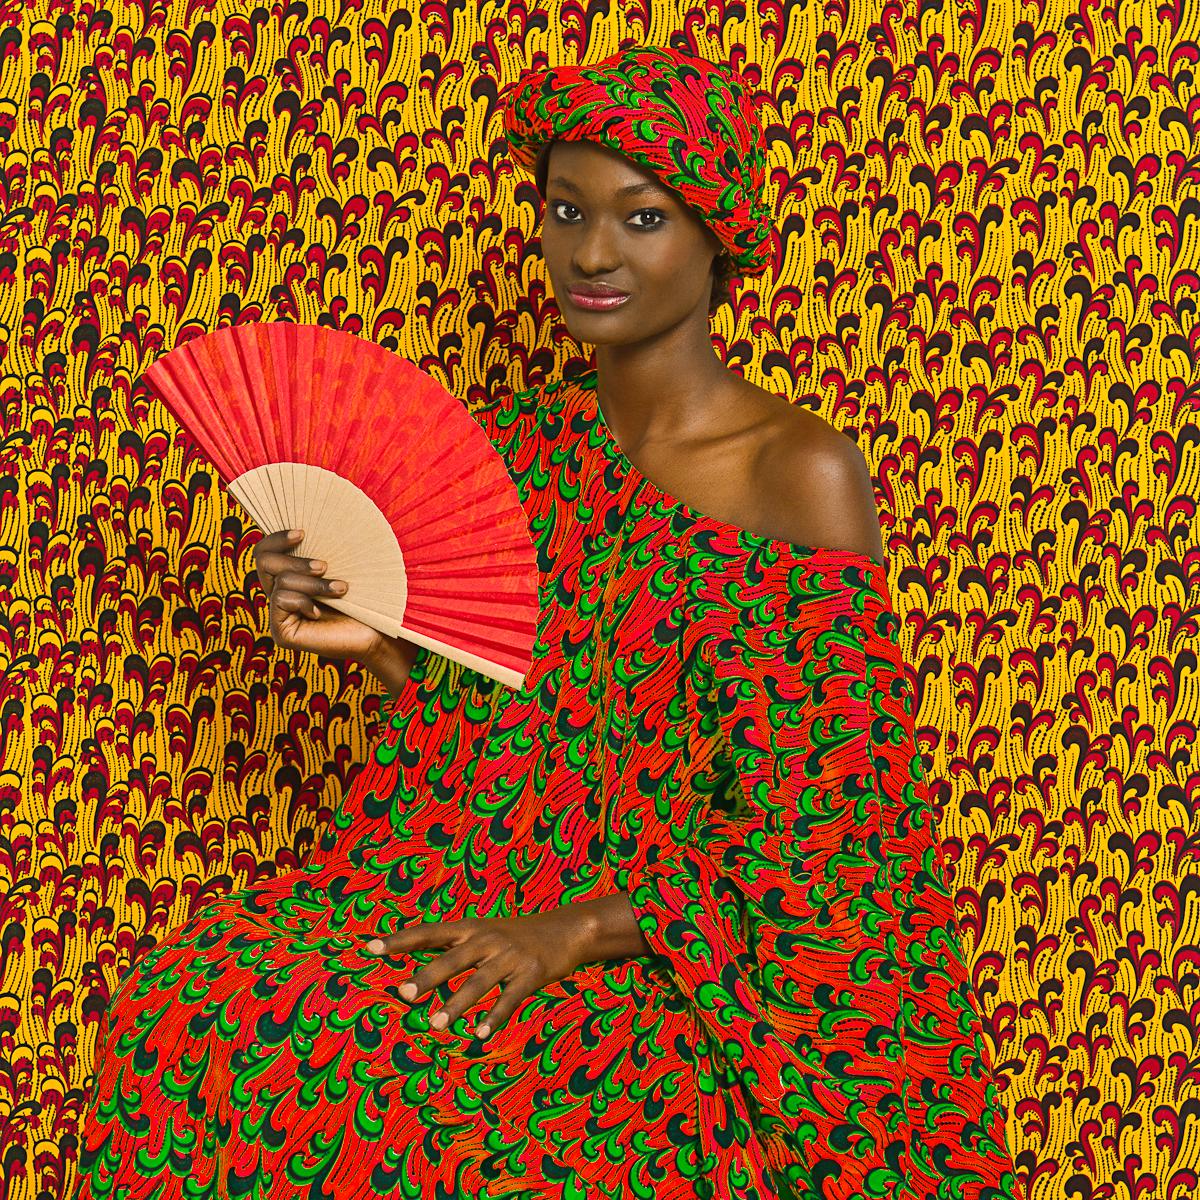 Omar Victor Diop, Aminata, série Le Studio des vanités, 2012